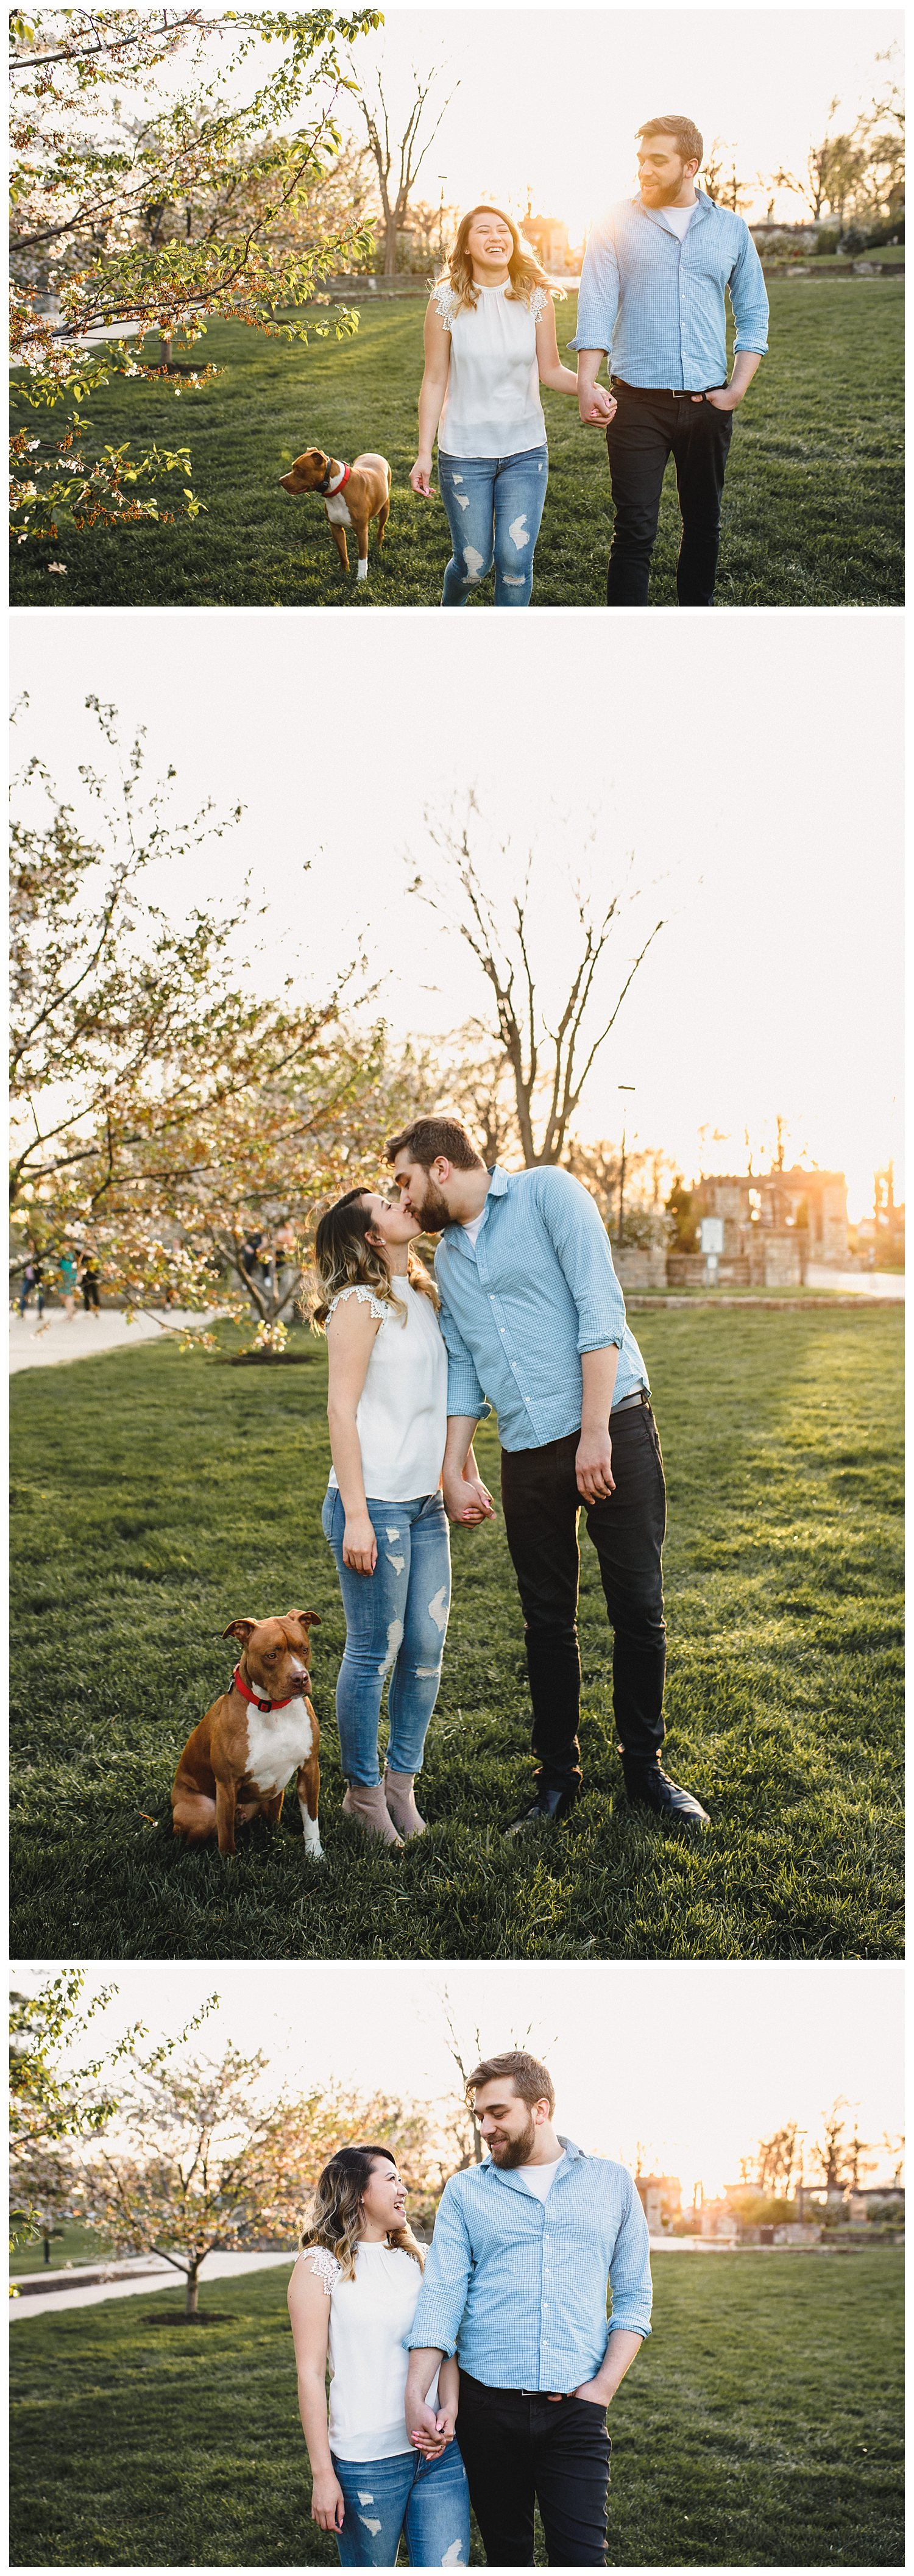 Kelsey_Diane_Photography_Kansas_City_Engagement_Loose_Park_Dog_In_Home_Engagement_Rosa_Joe_Pit_Bull_Loose_Park_0568.jpg